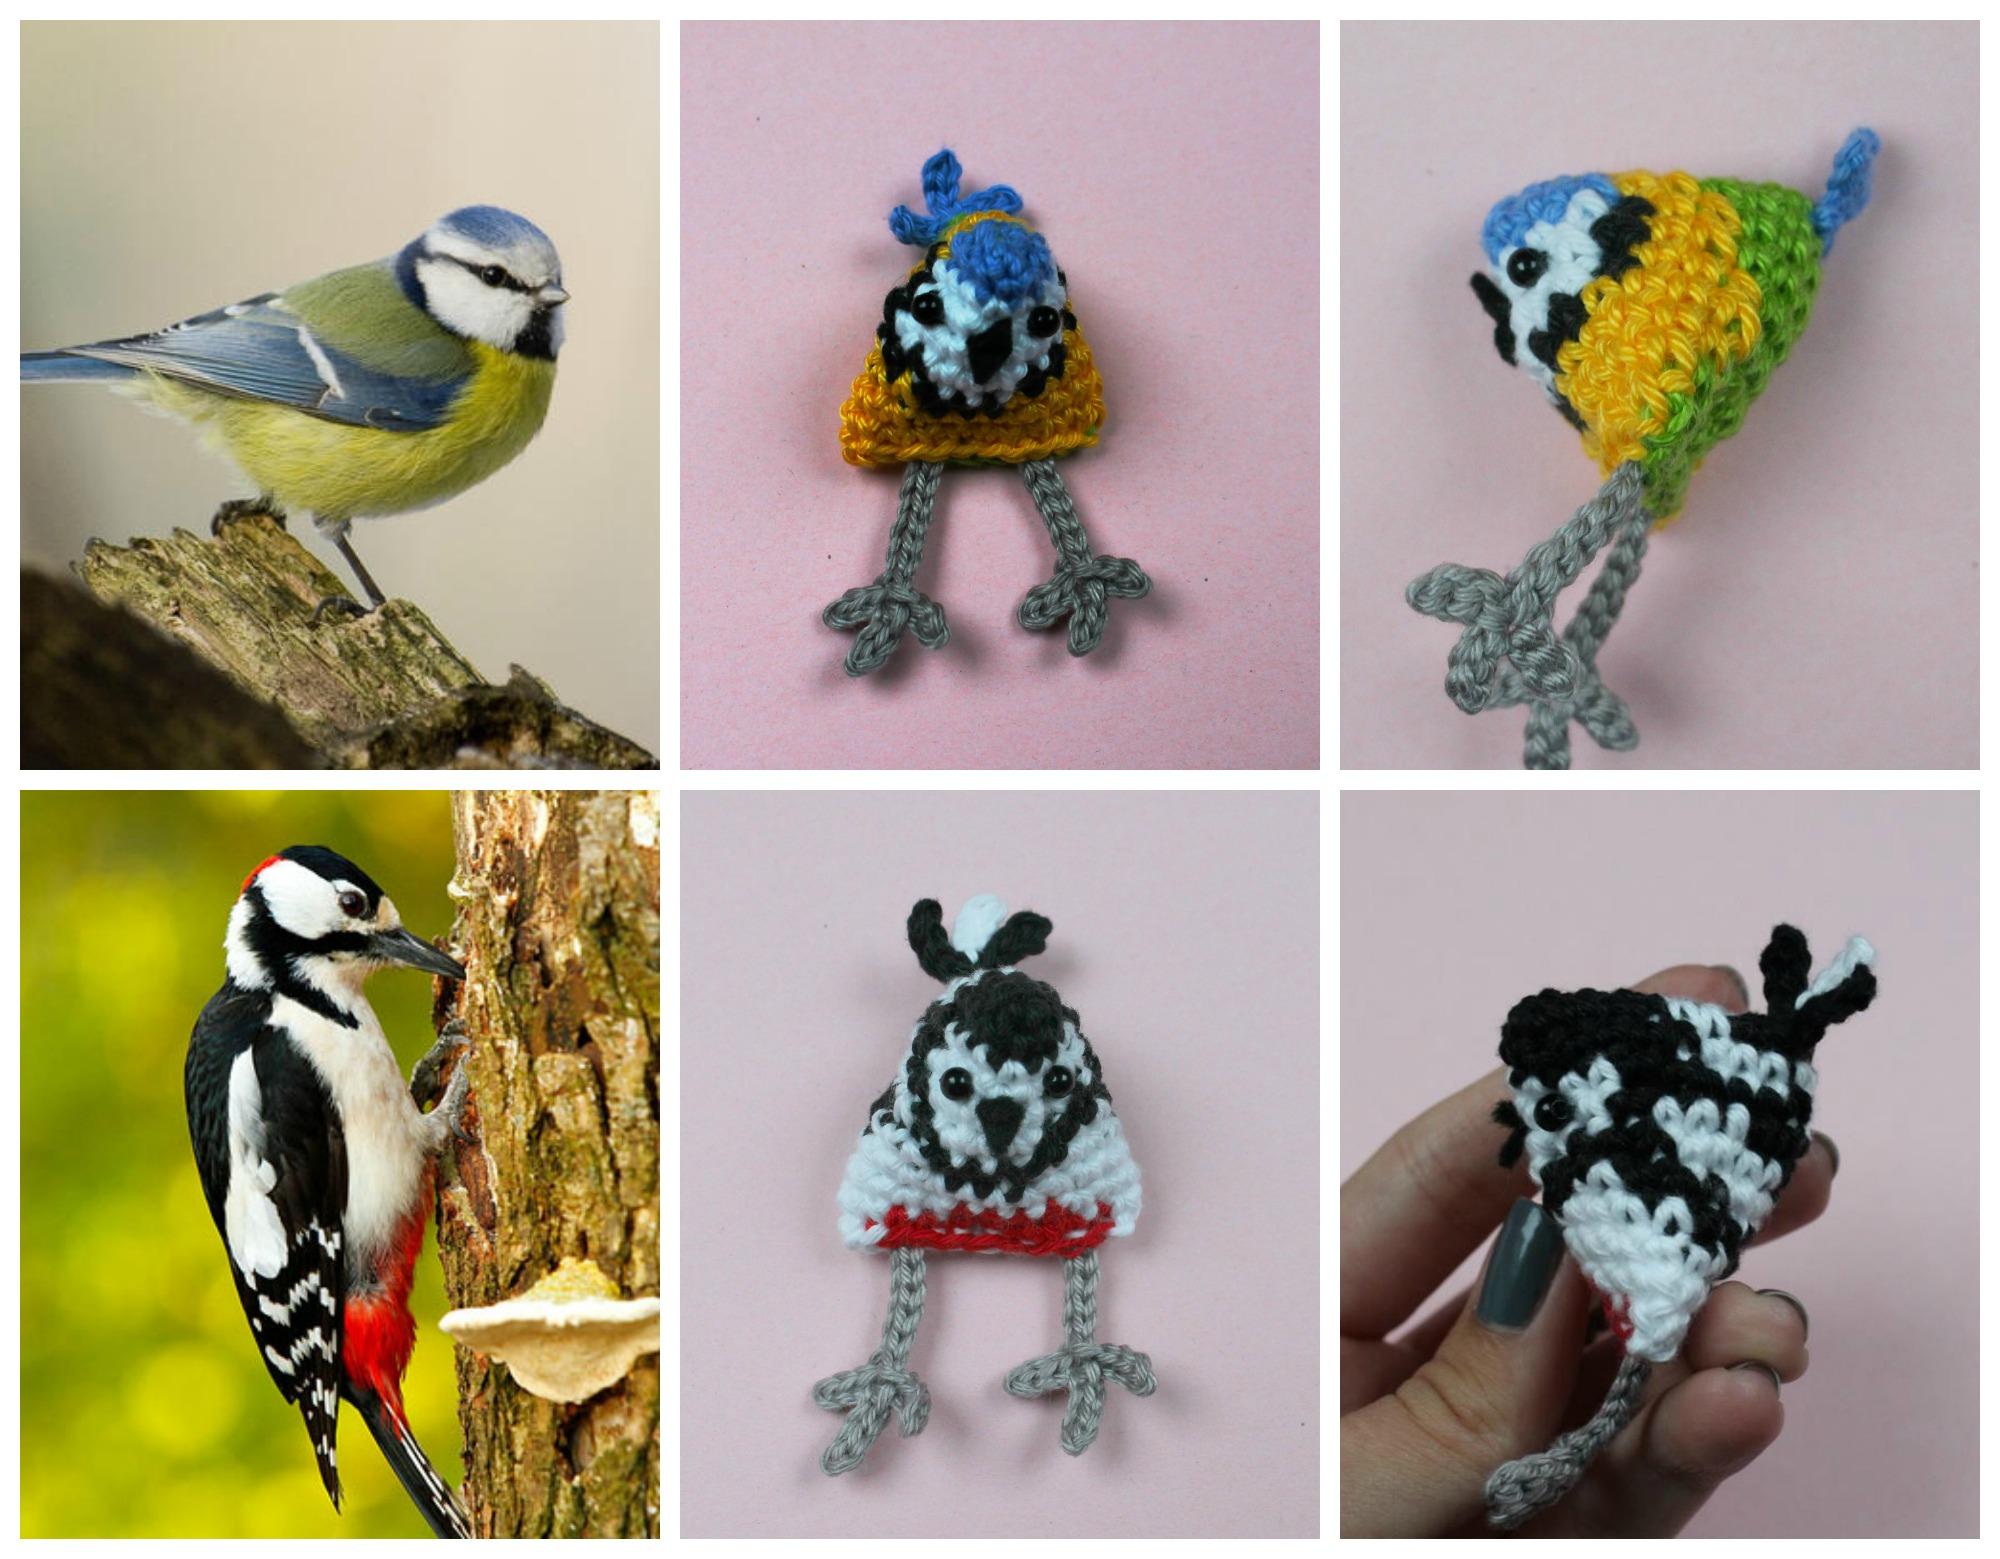 birdycollage2